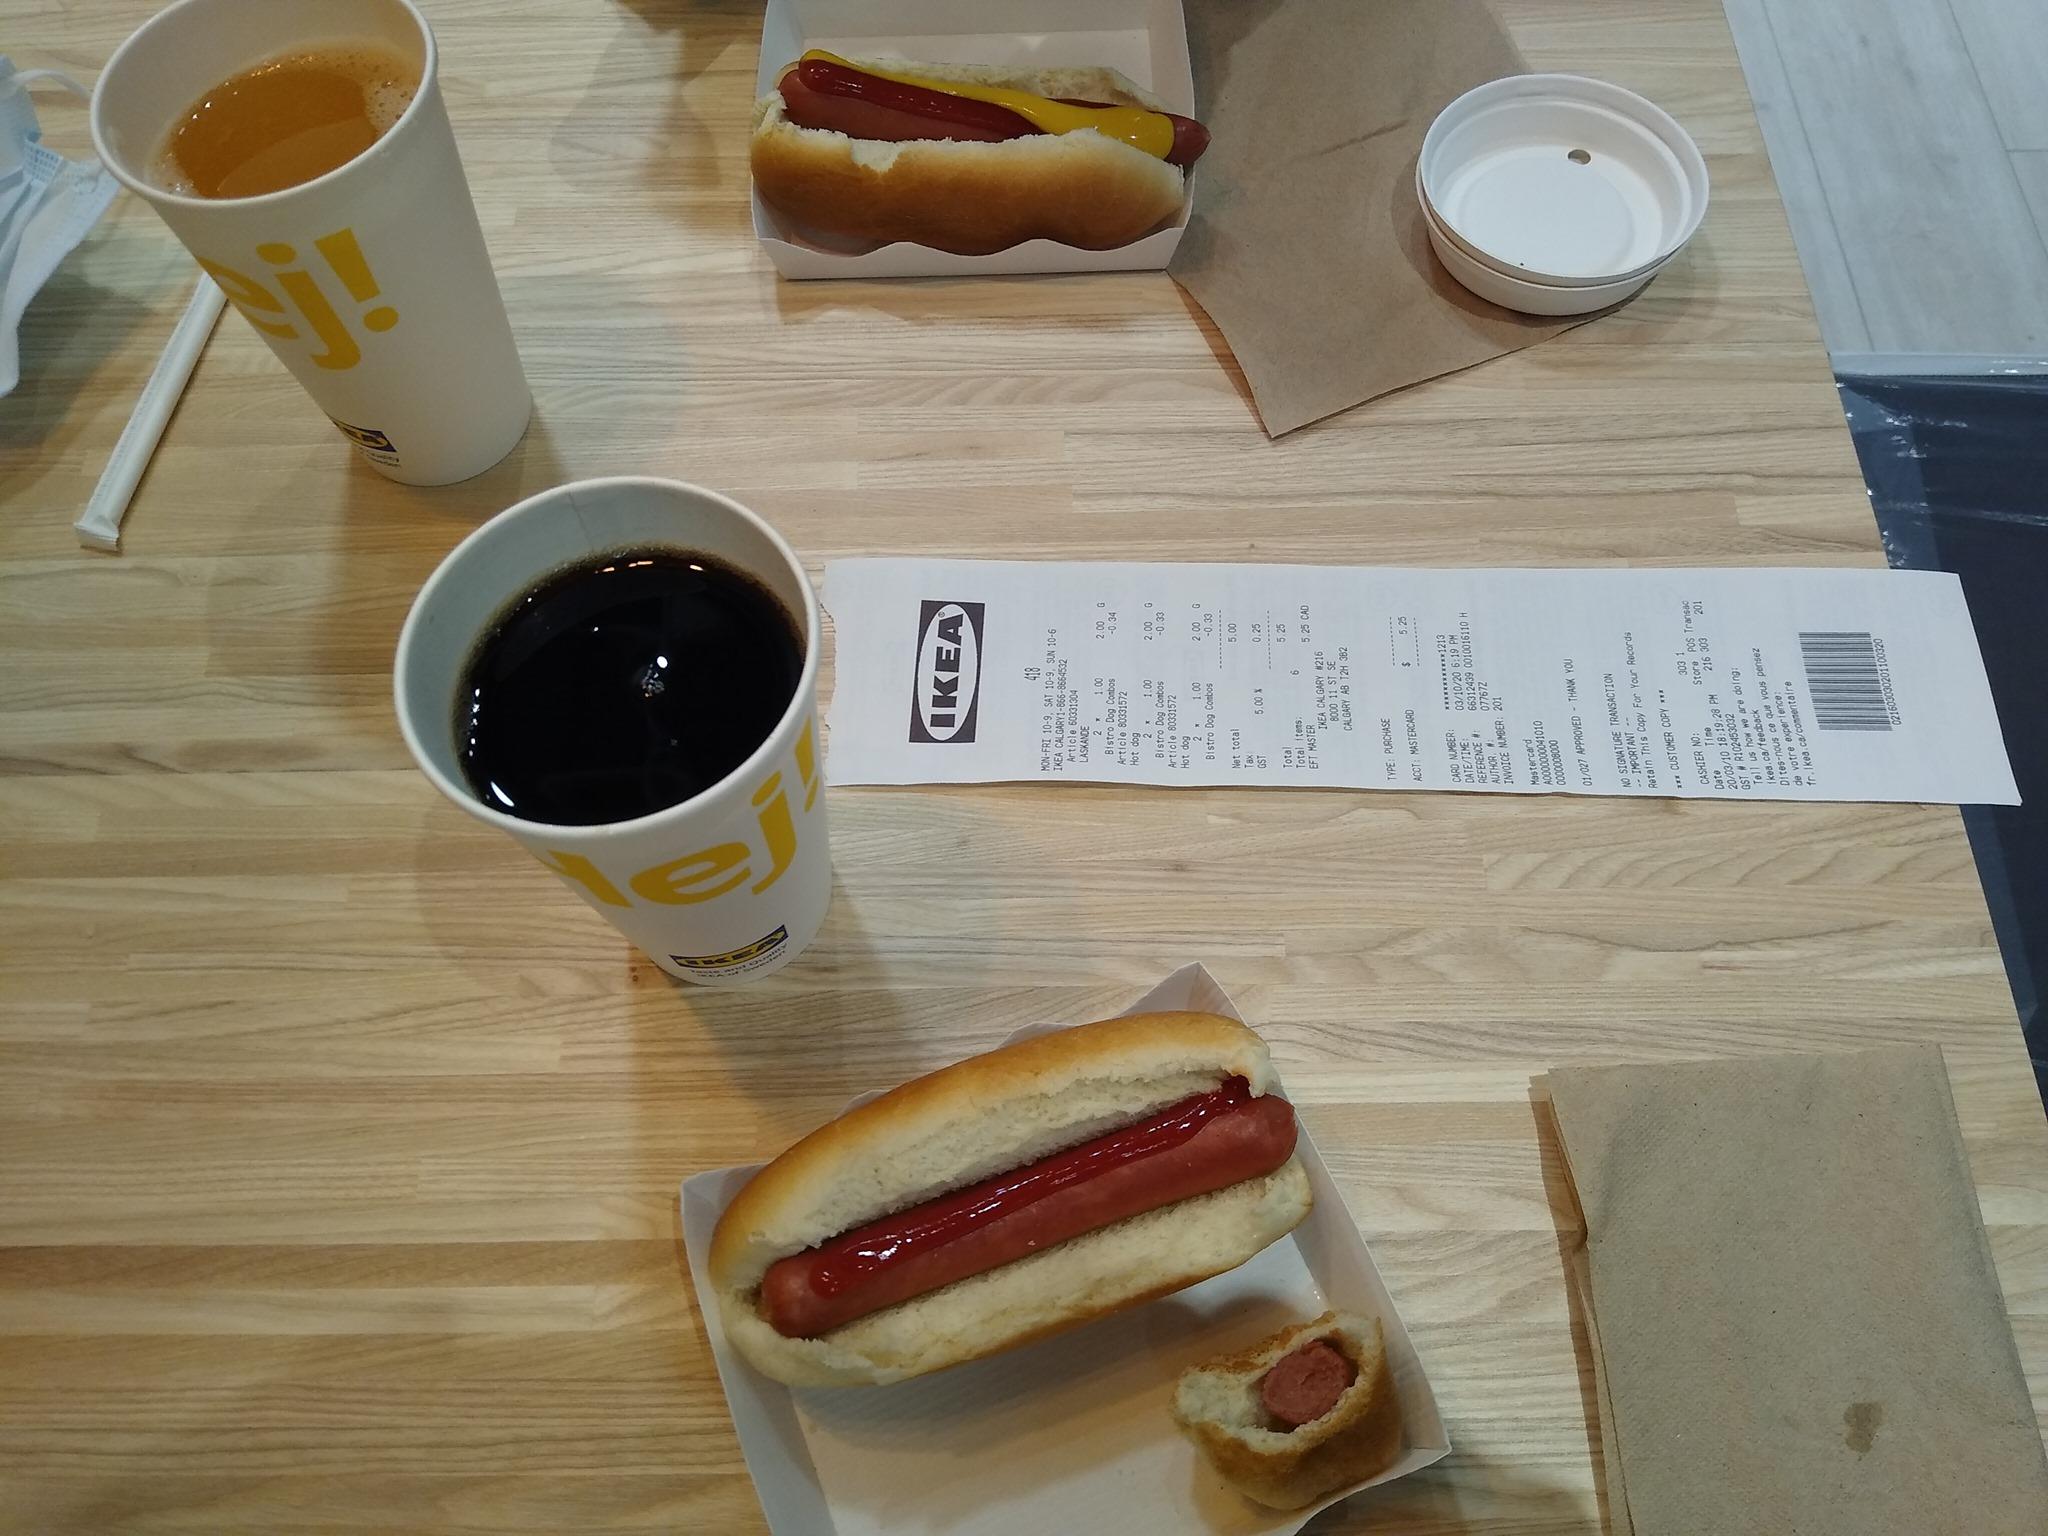 ikea-hotdog.jpg